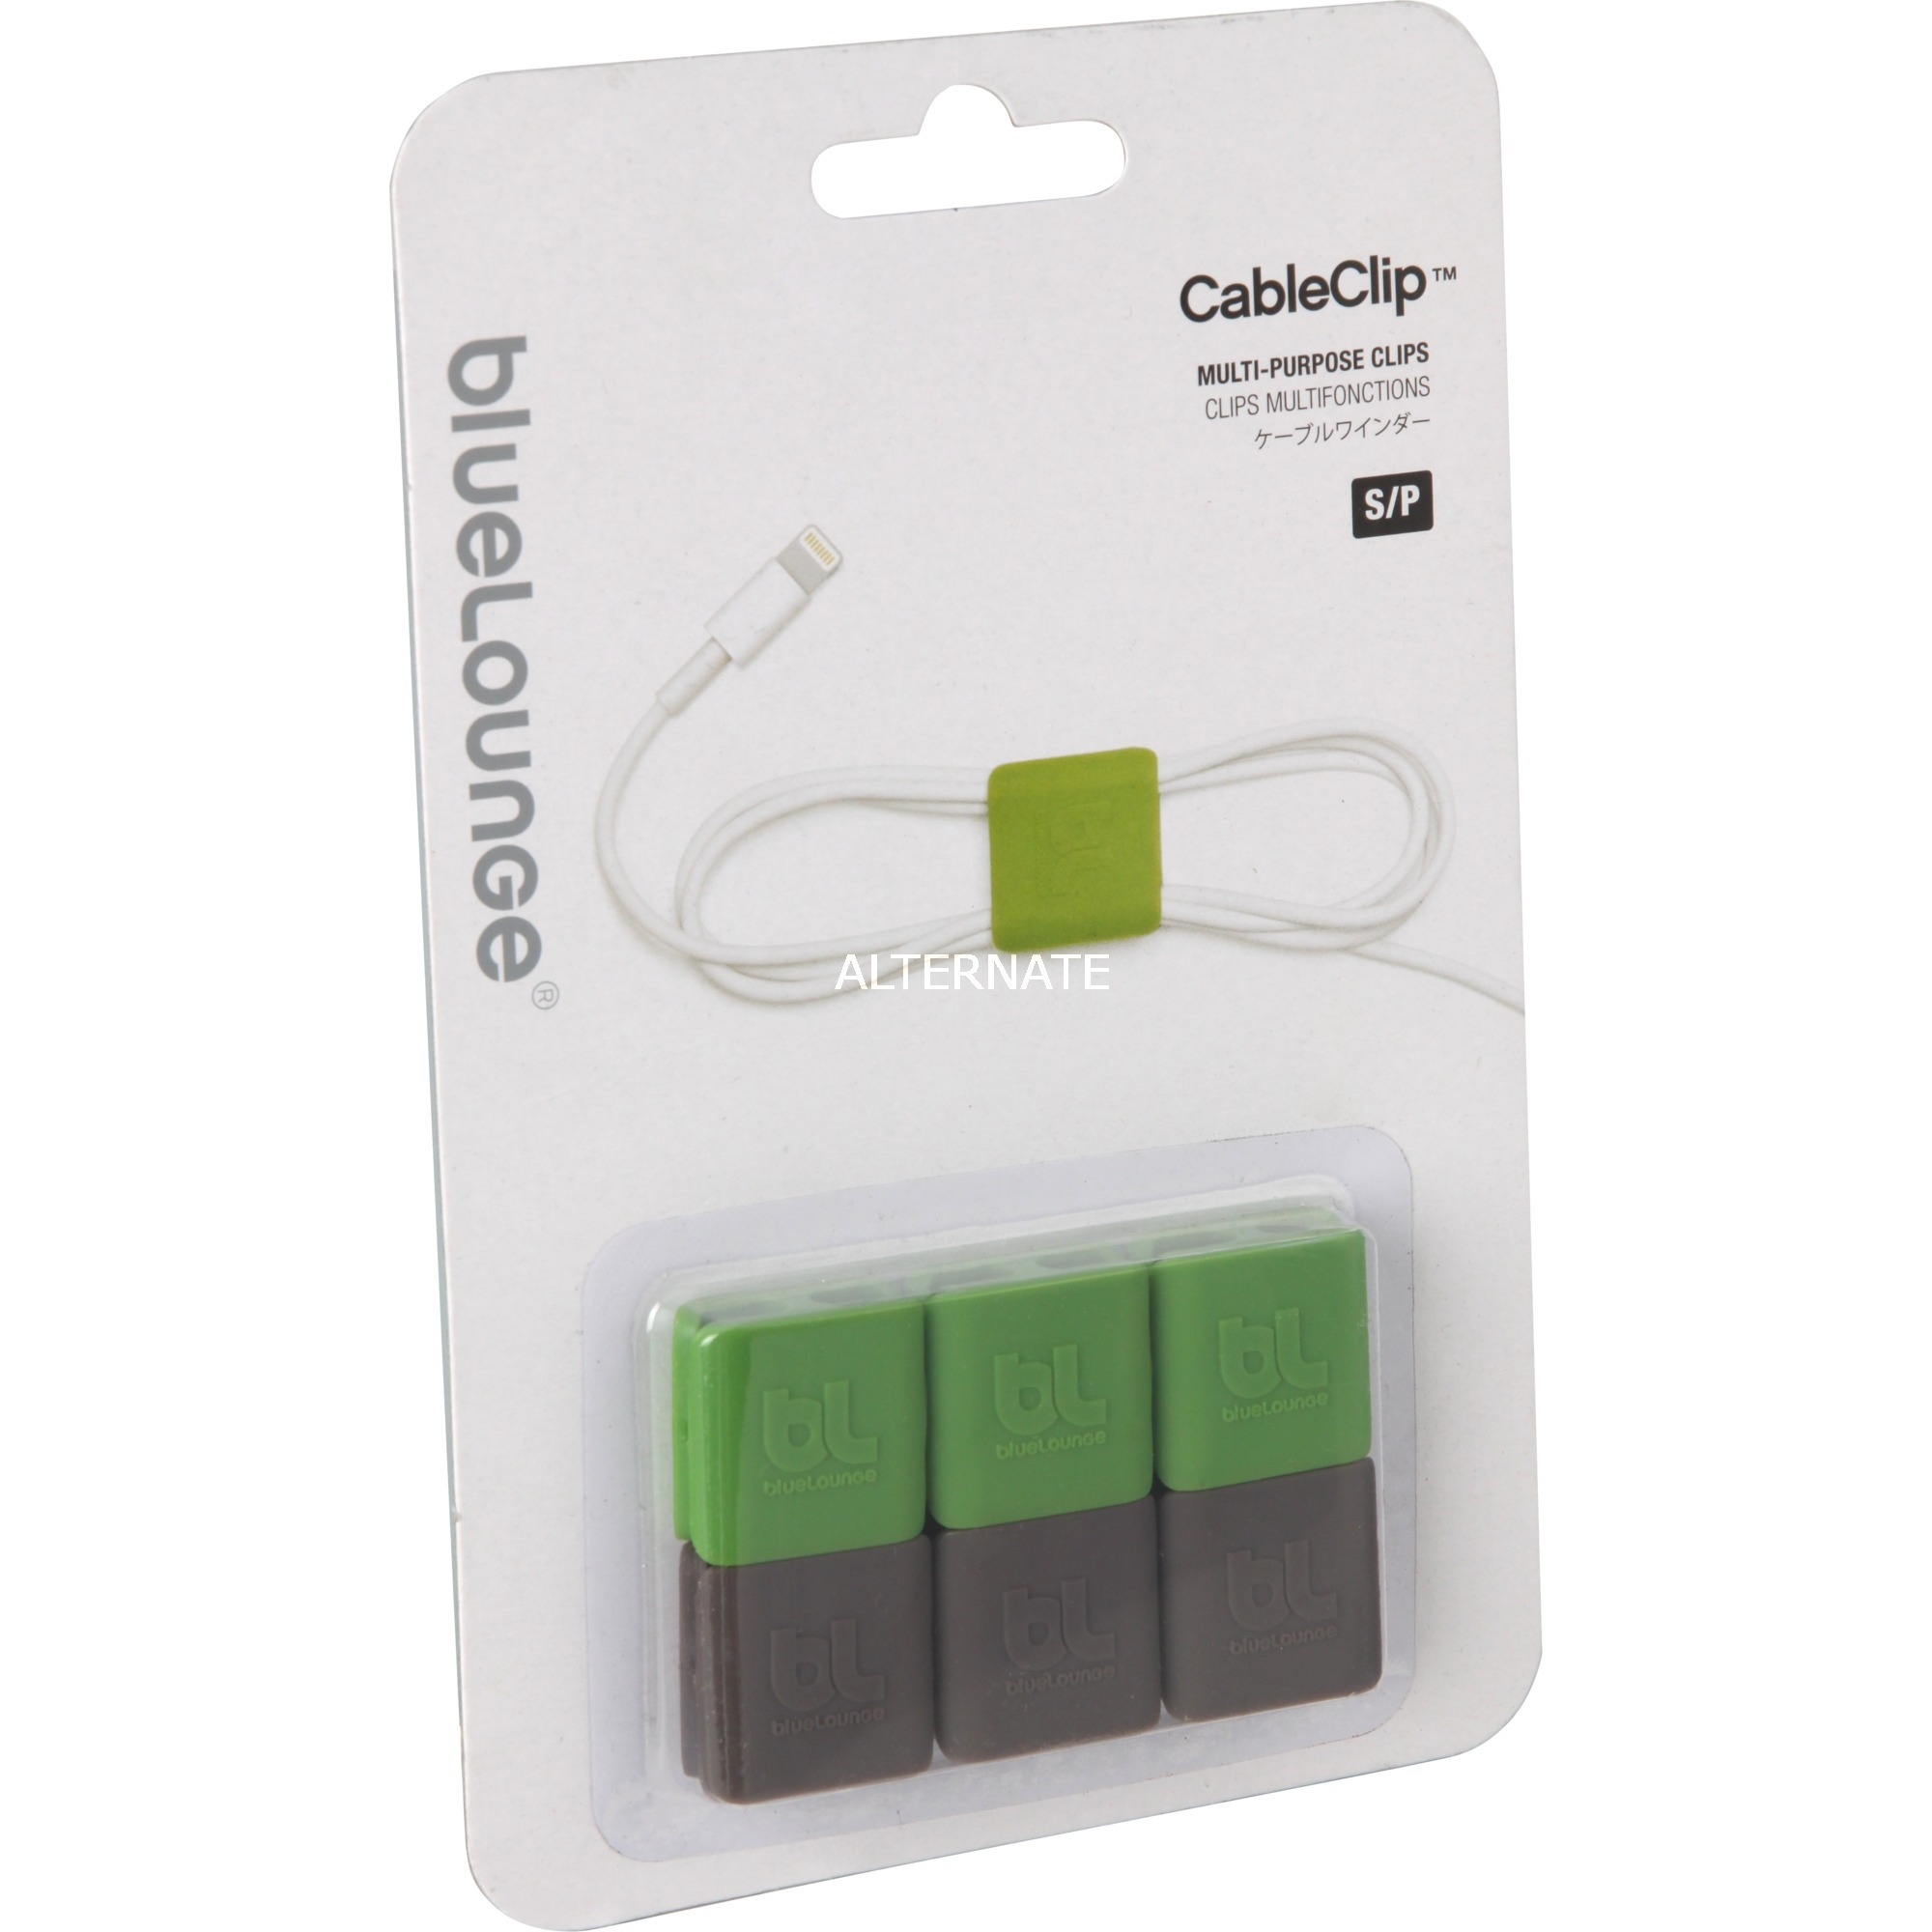 CableClip Small Verde, Gris abrazadera para cable, Fijación/Instalación